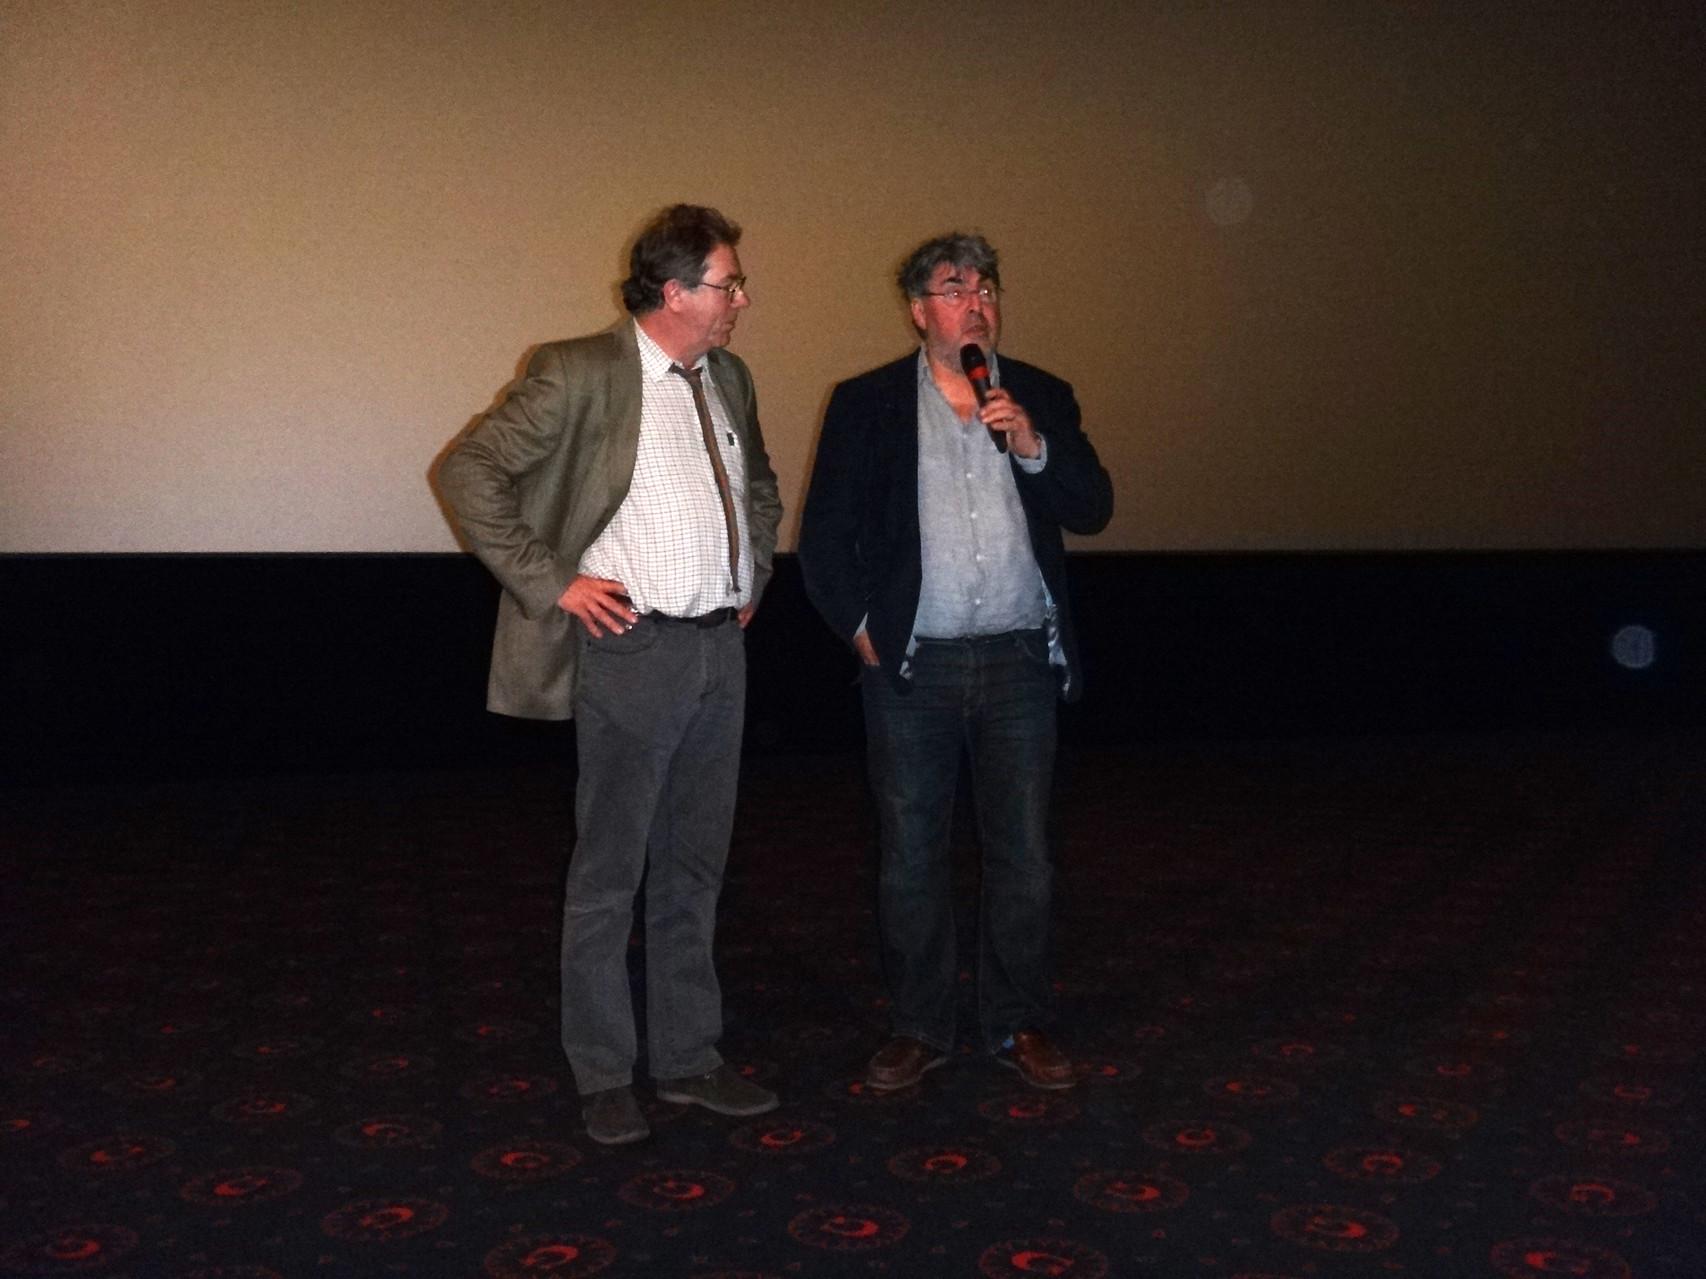 Peter Barton et Mike Fox